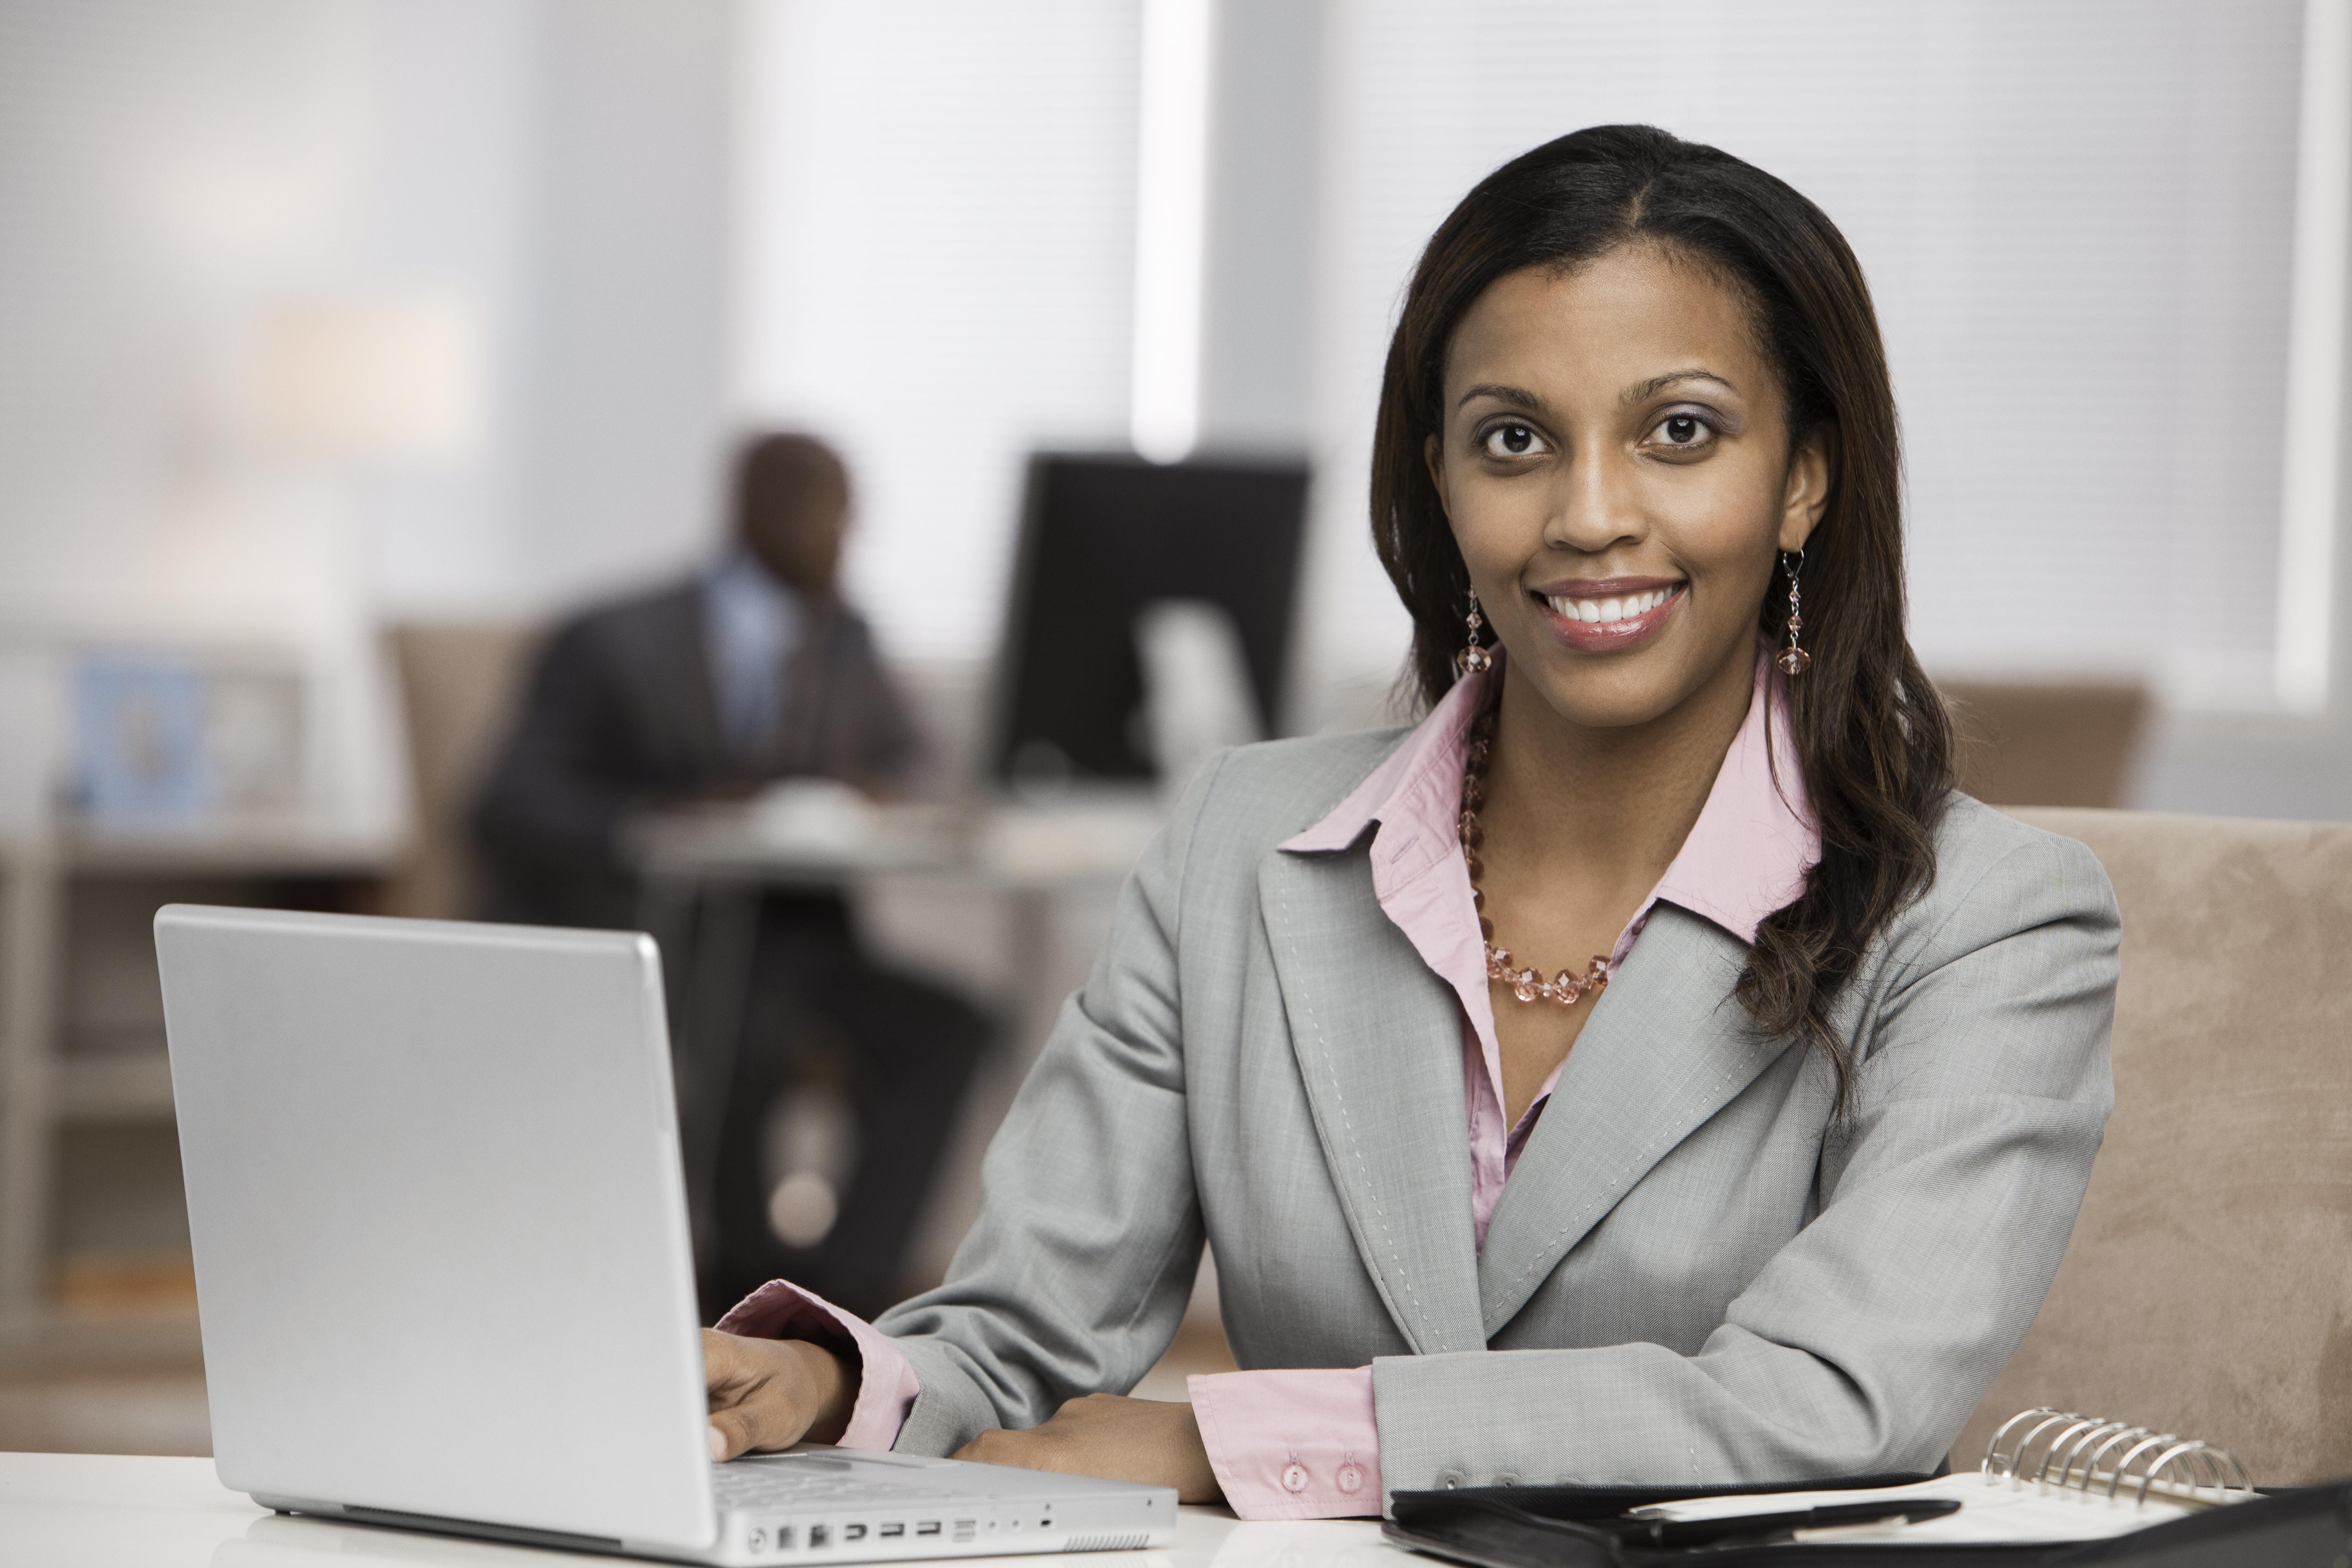 Mixed race businesswoman using laptop at desk